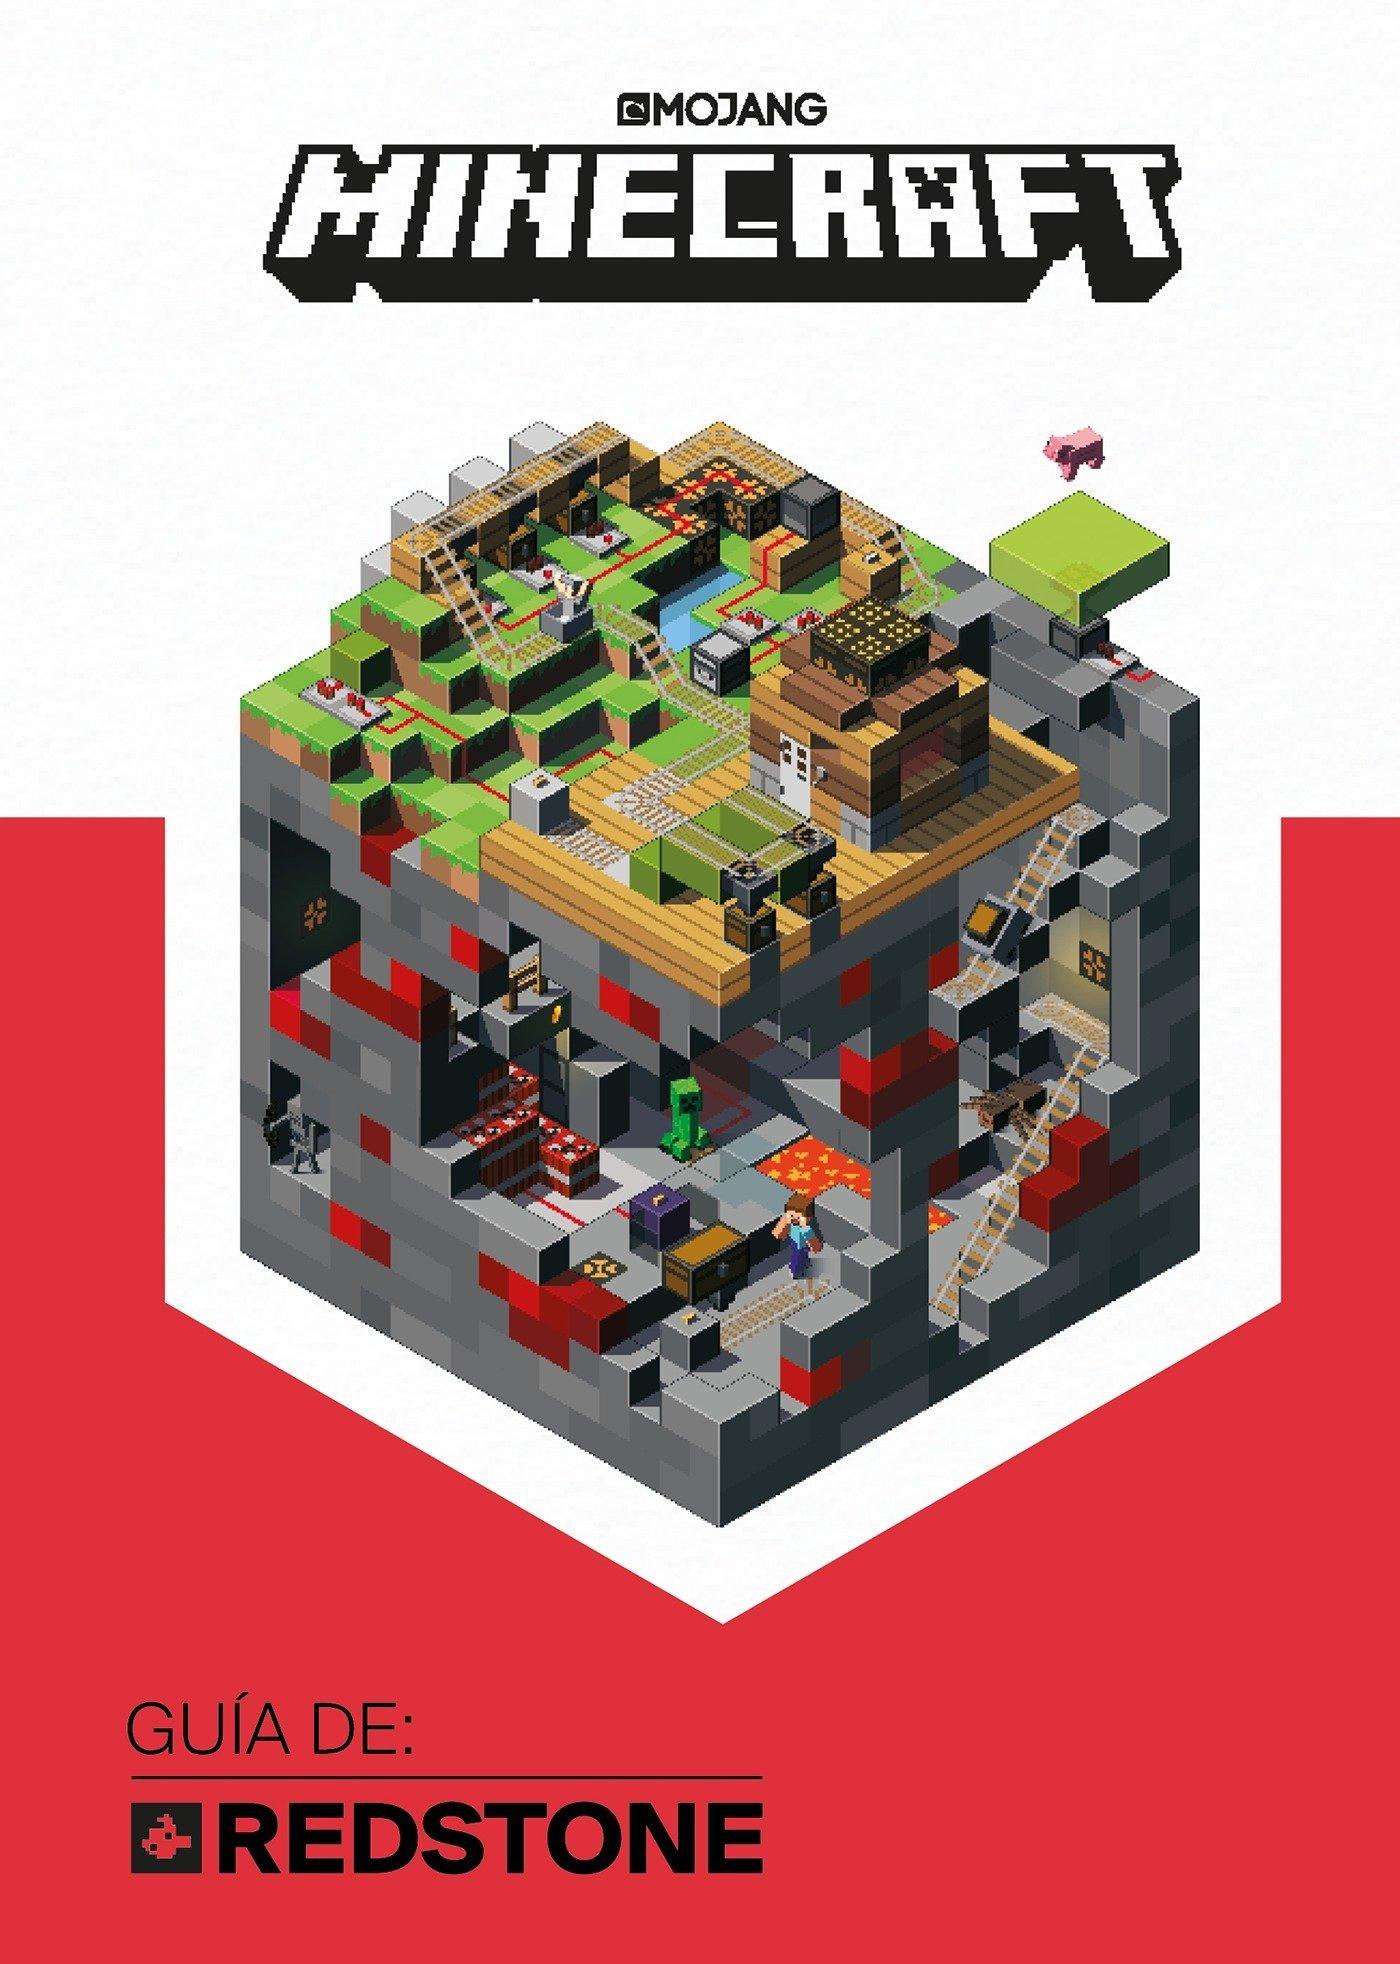 Minecraft. Guia de: Redstone / Minecraft: Guide to Redstone (Spanish Edition) by Montena